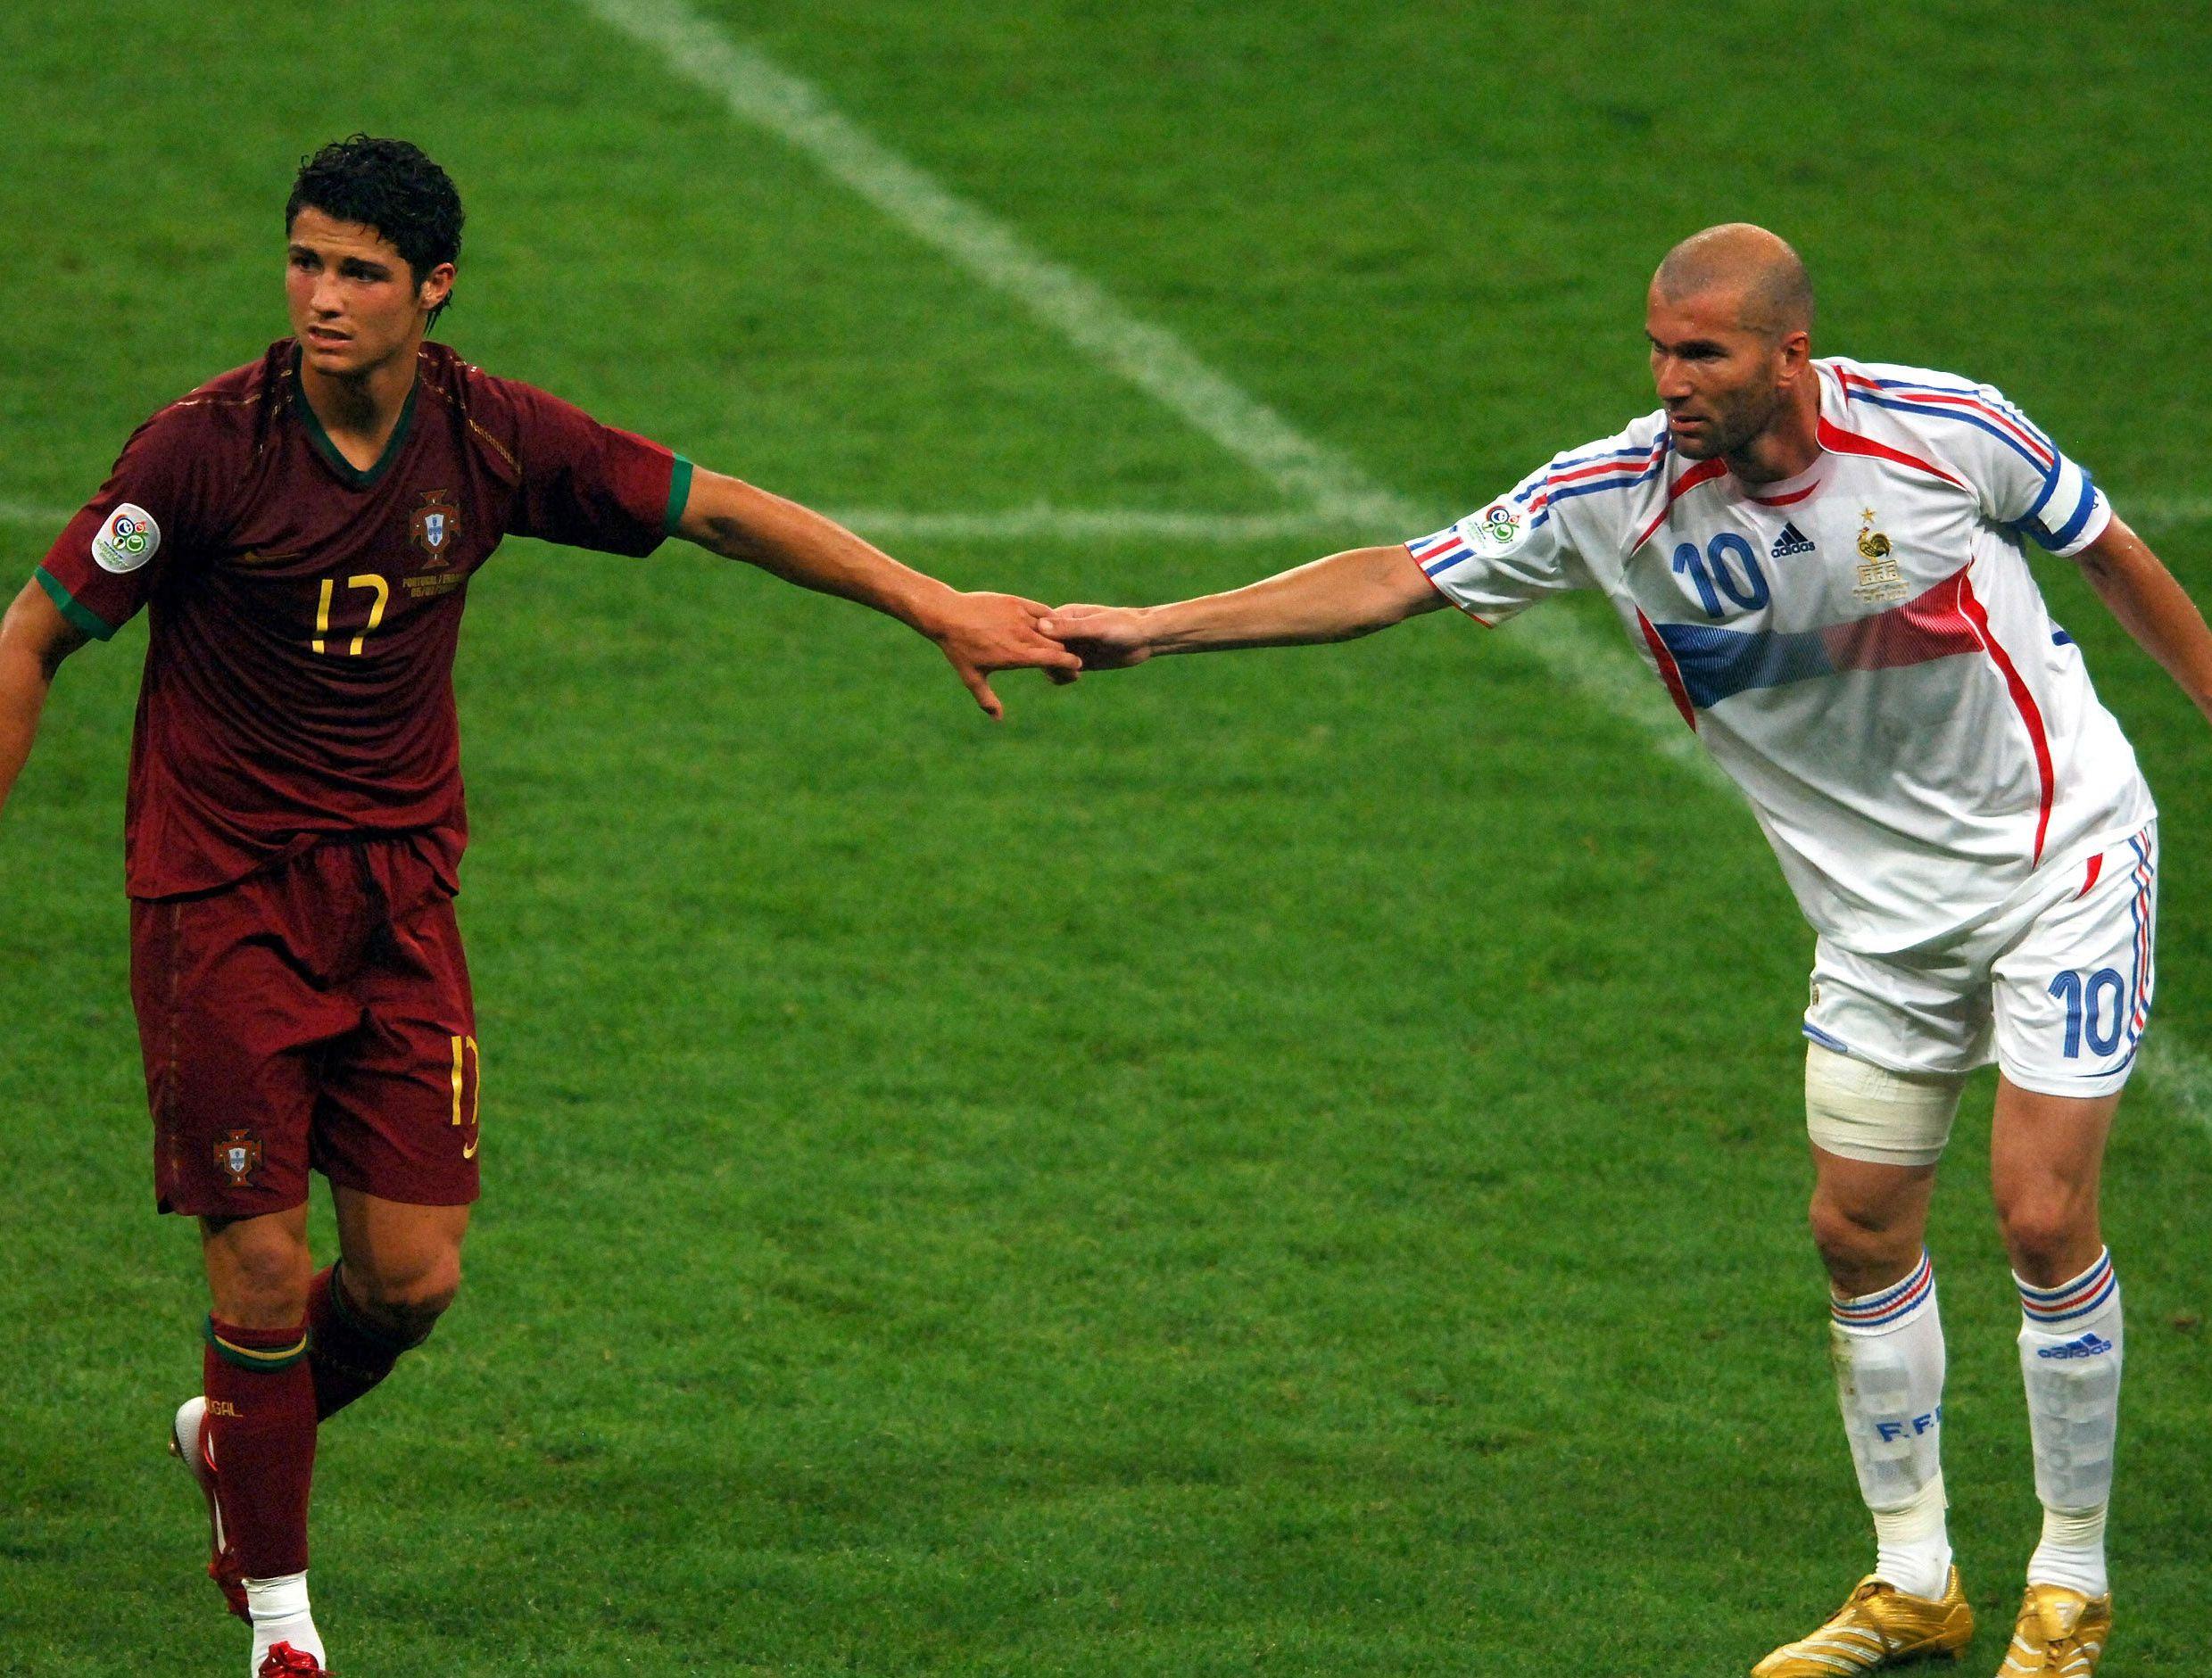 3 fotos 3 de jugadores raras hist ricas etc - France portugal coupe du monde 2006 ...